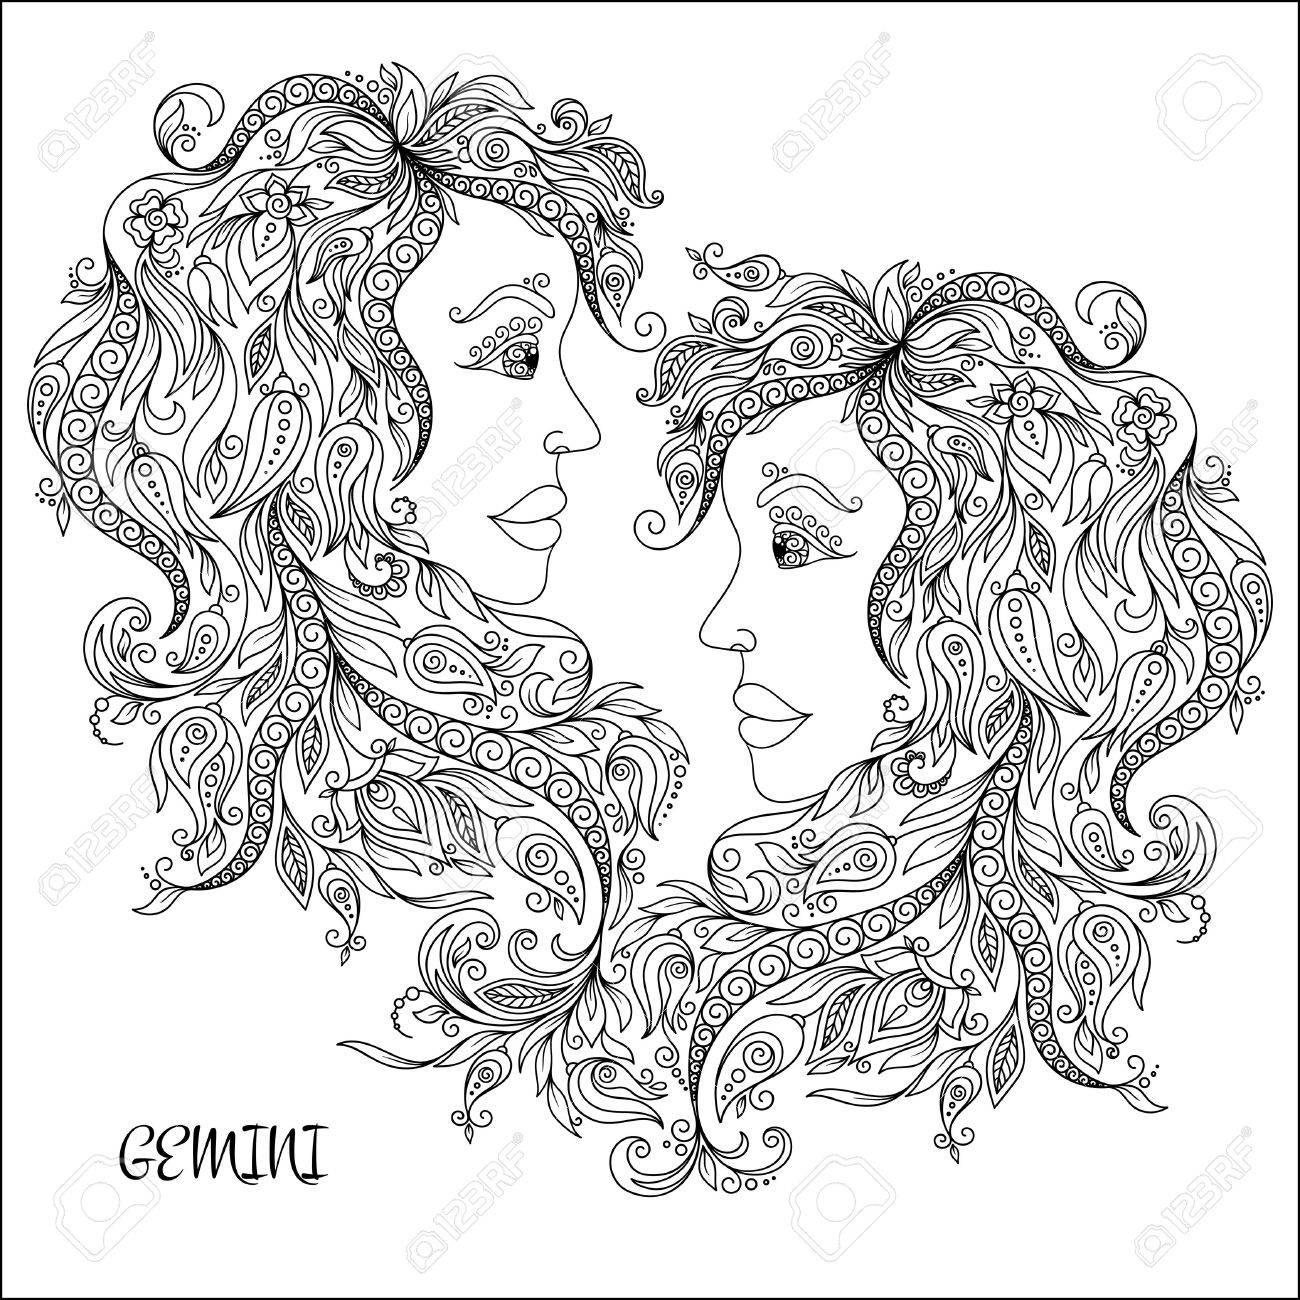 Pattern For Coloring Book Hand Drawn Line Flowers Art Of Zodiac Gemini Horoscope Symbol